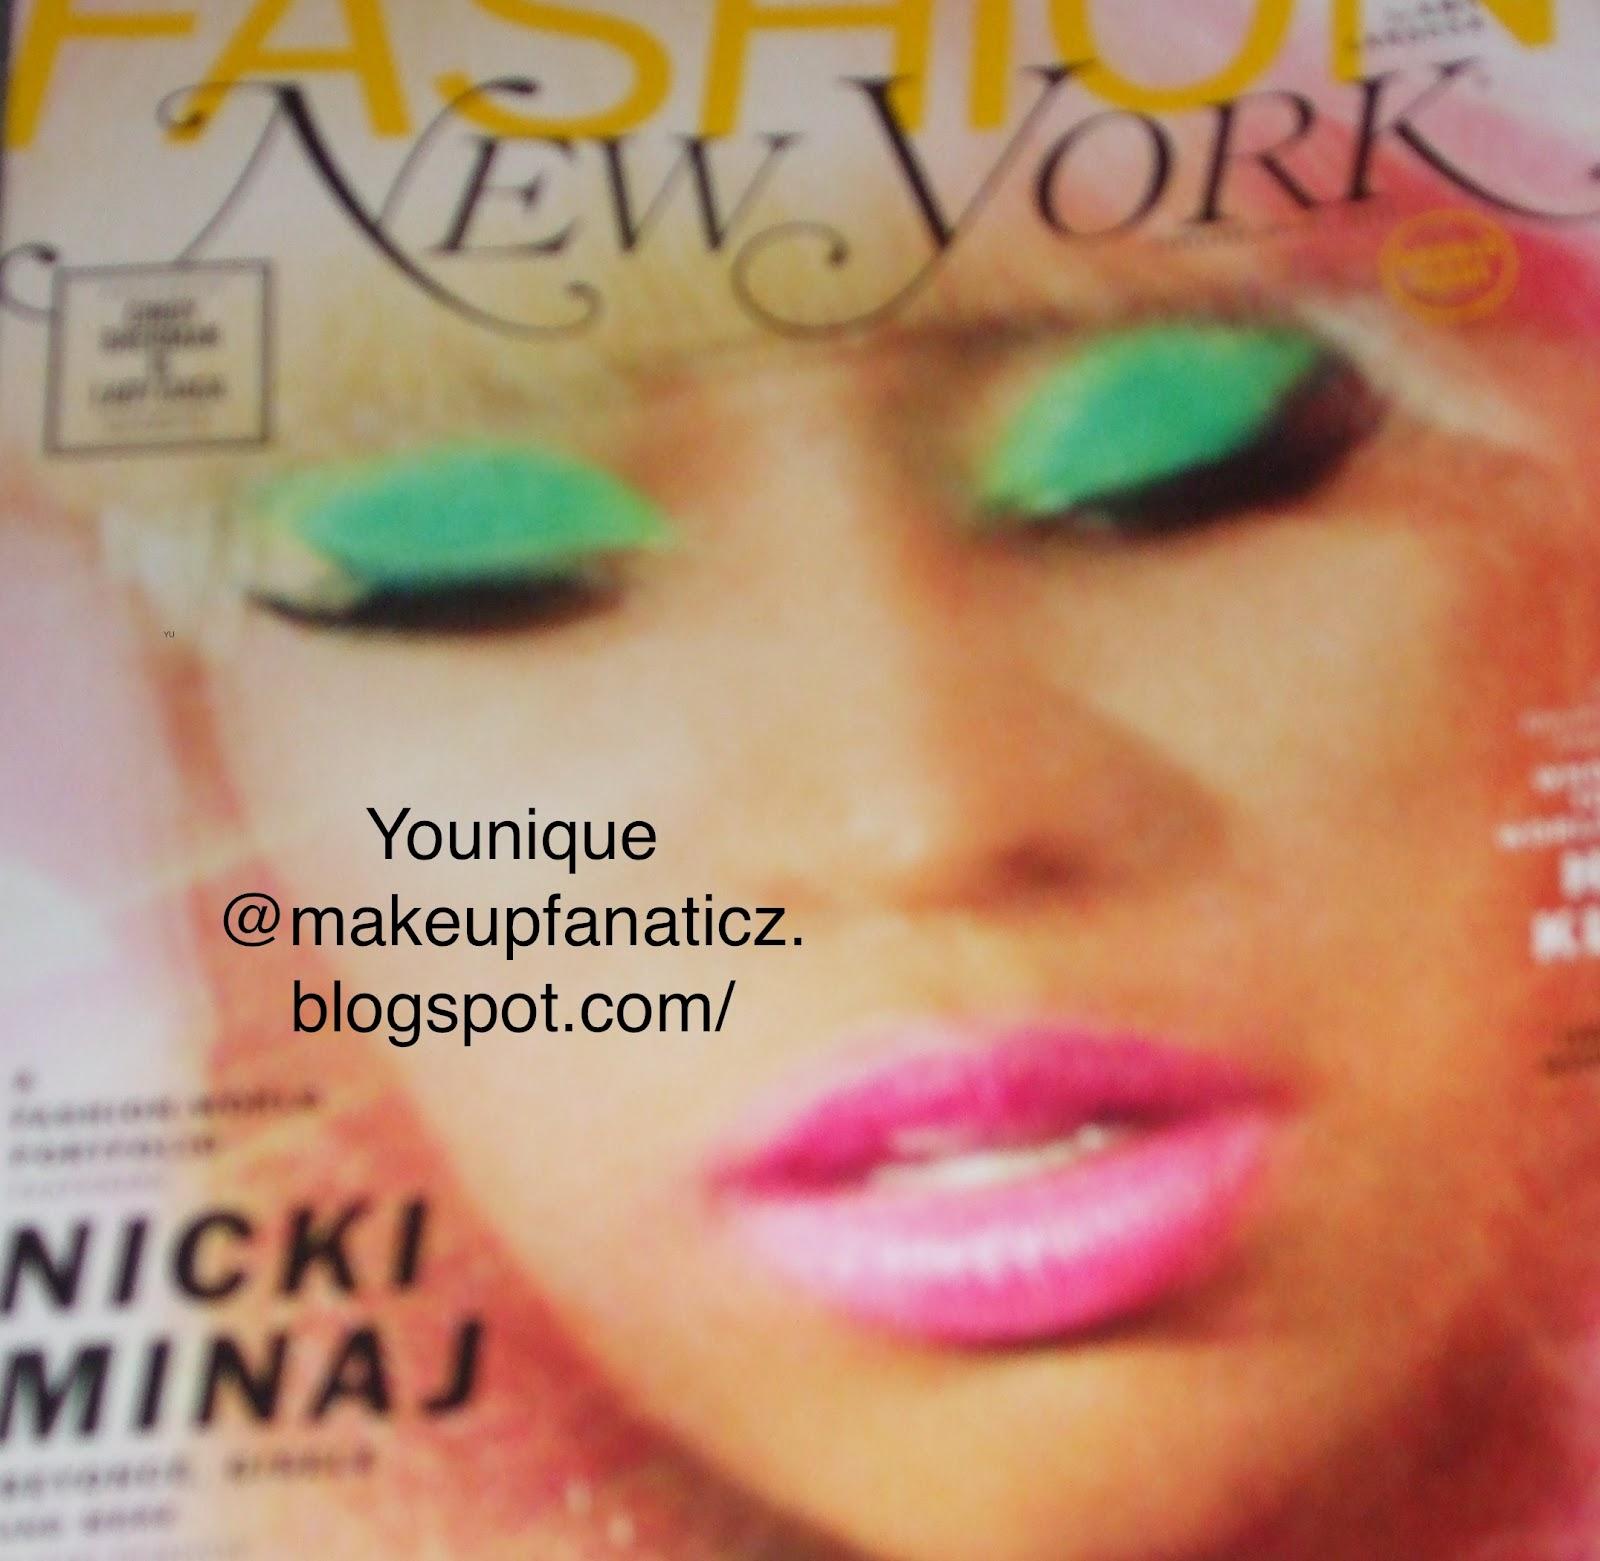 http://1.bp.blogspot.com/-0YblddWQJyI/T4u7nnWlLaI/AAAAAAAAAD8/ovx_RA2exsk/s1600/DSCF3109.jpg